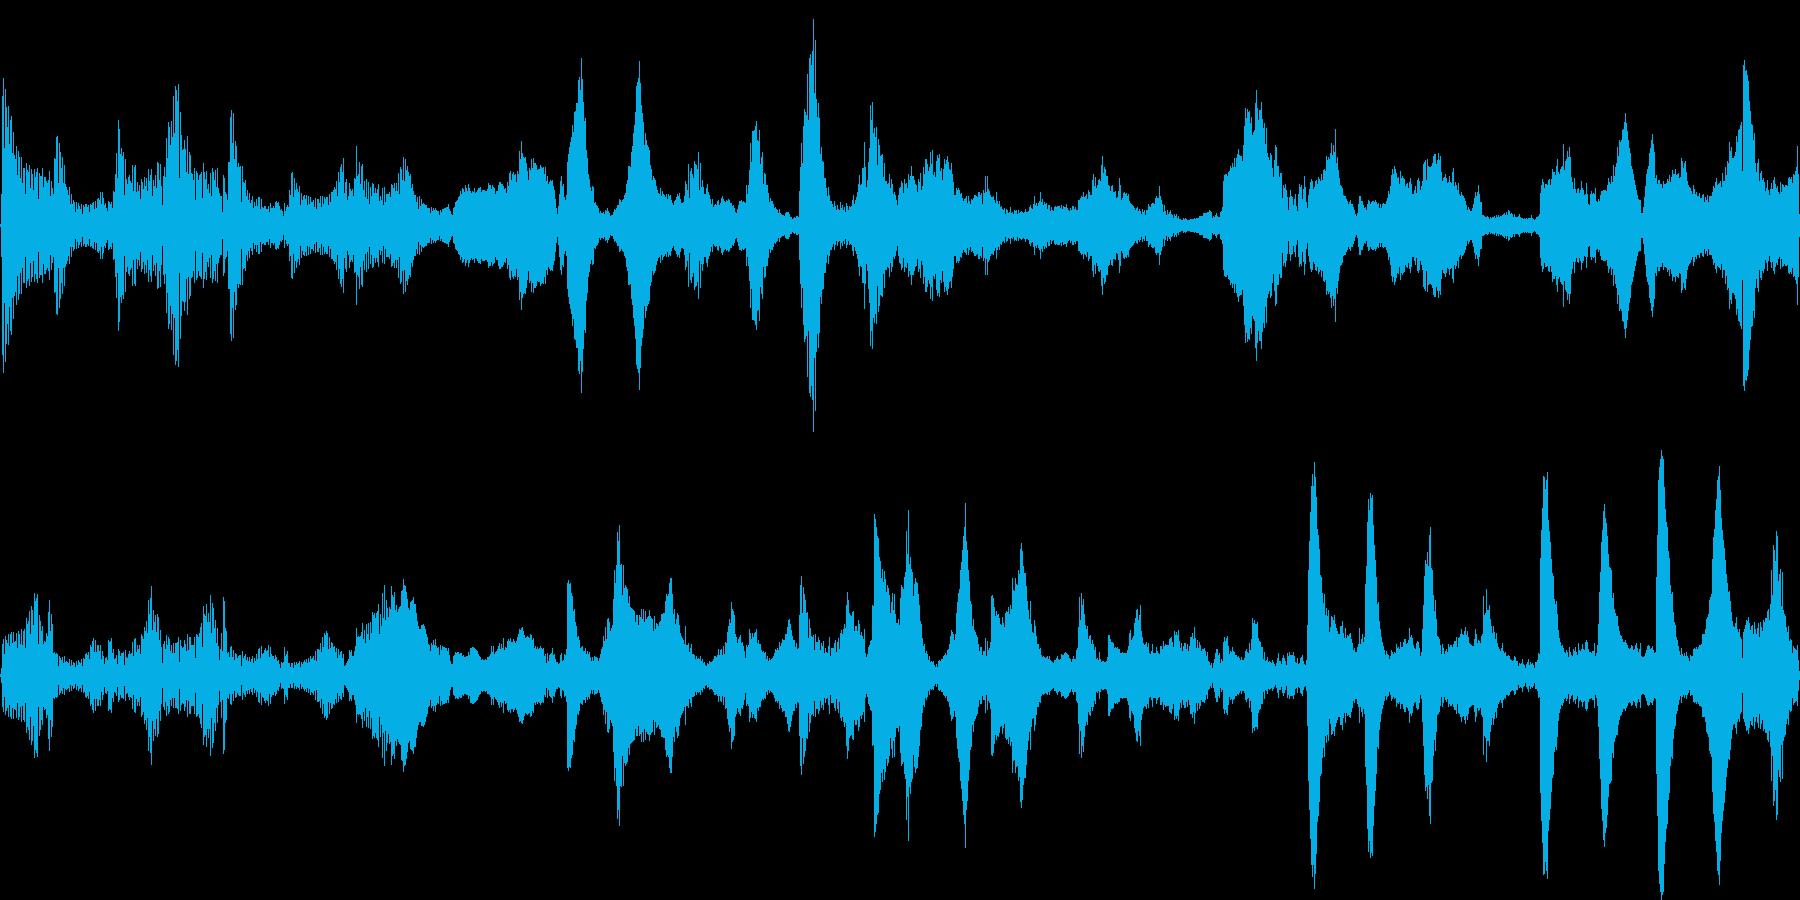 k009 アラーム音(ループ仕様)の再生済みの波形